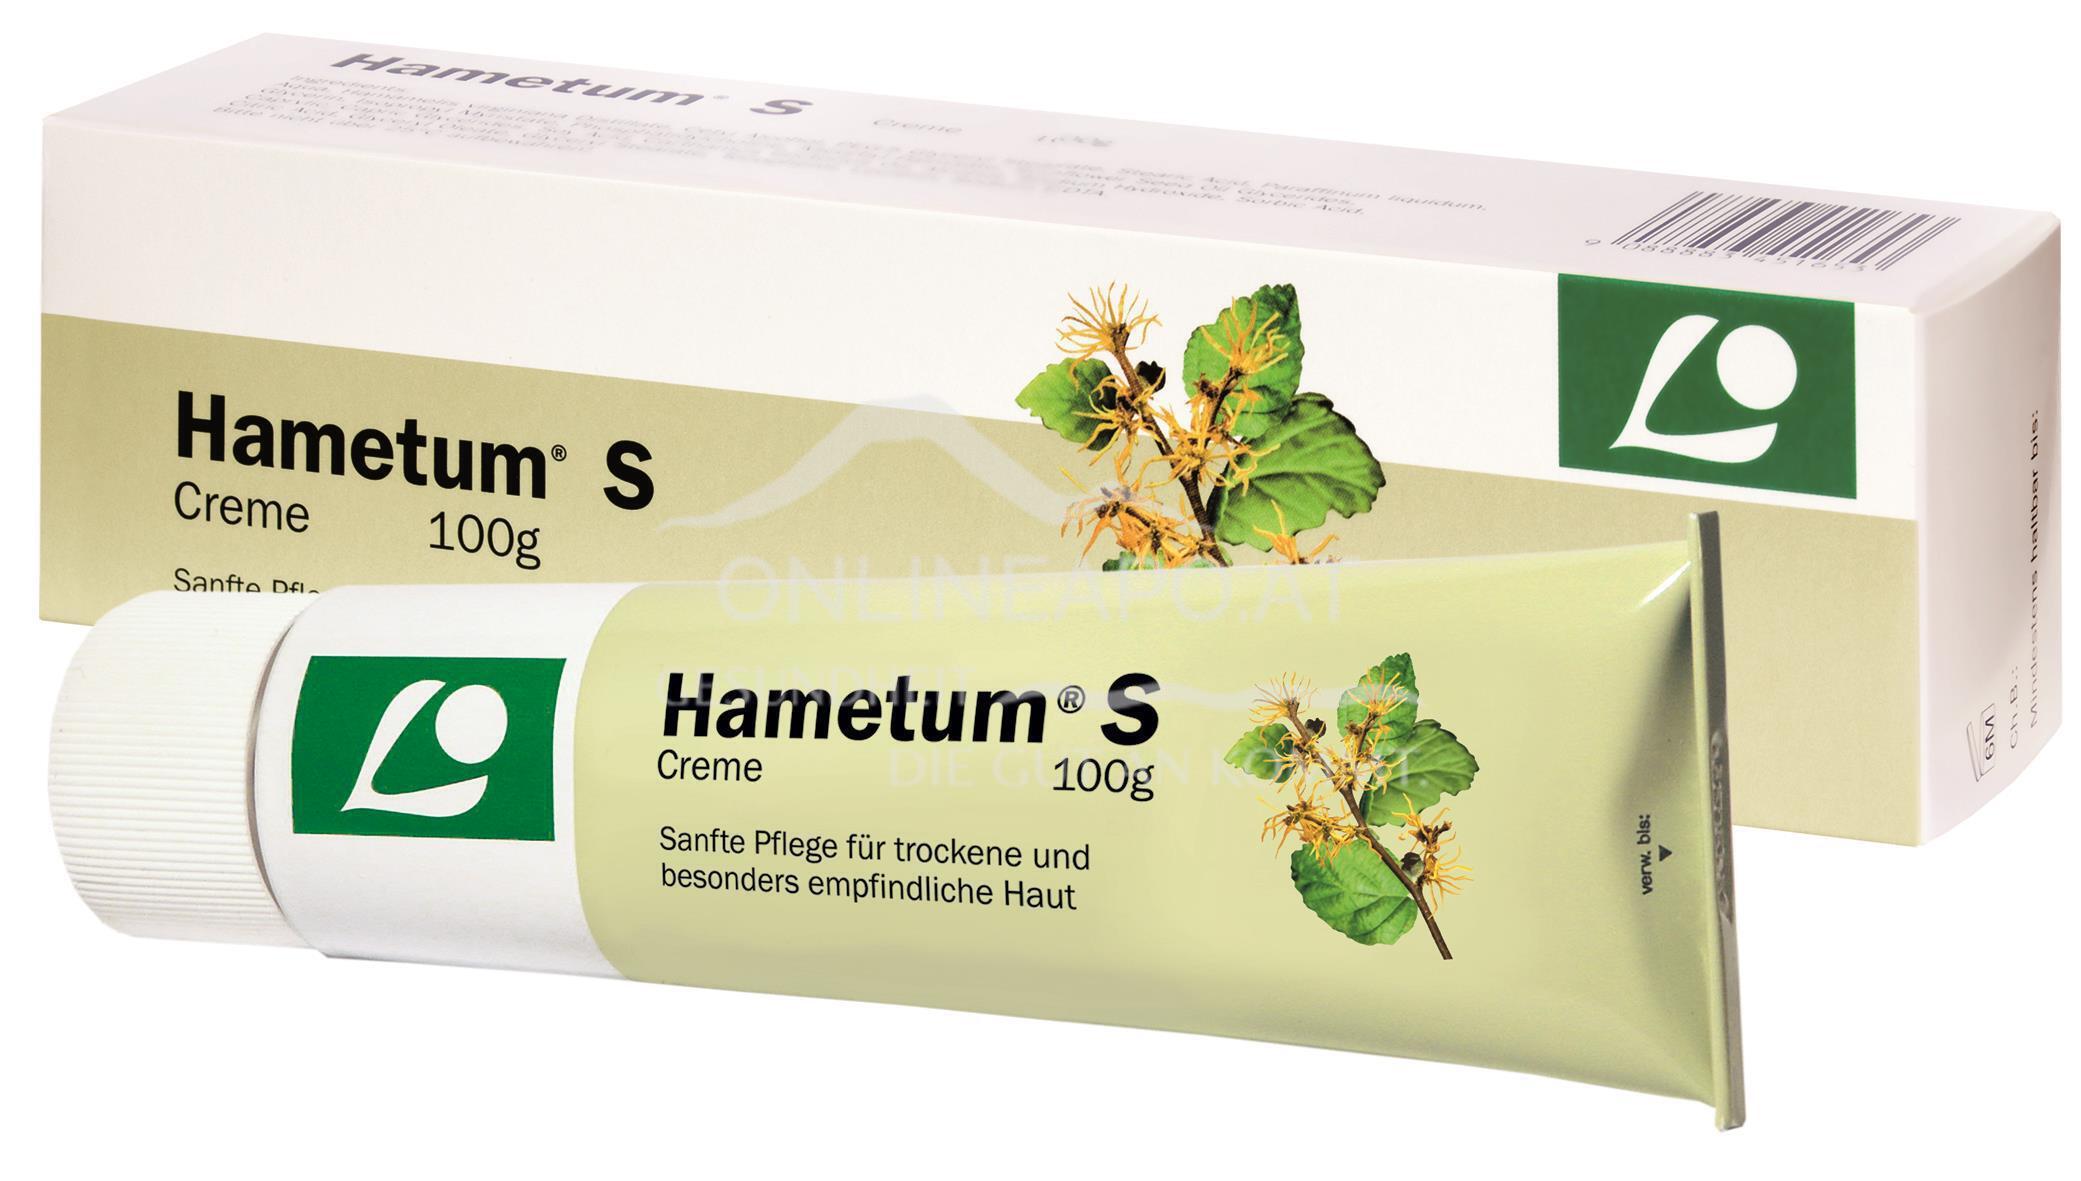 Hametum®